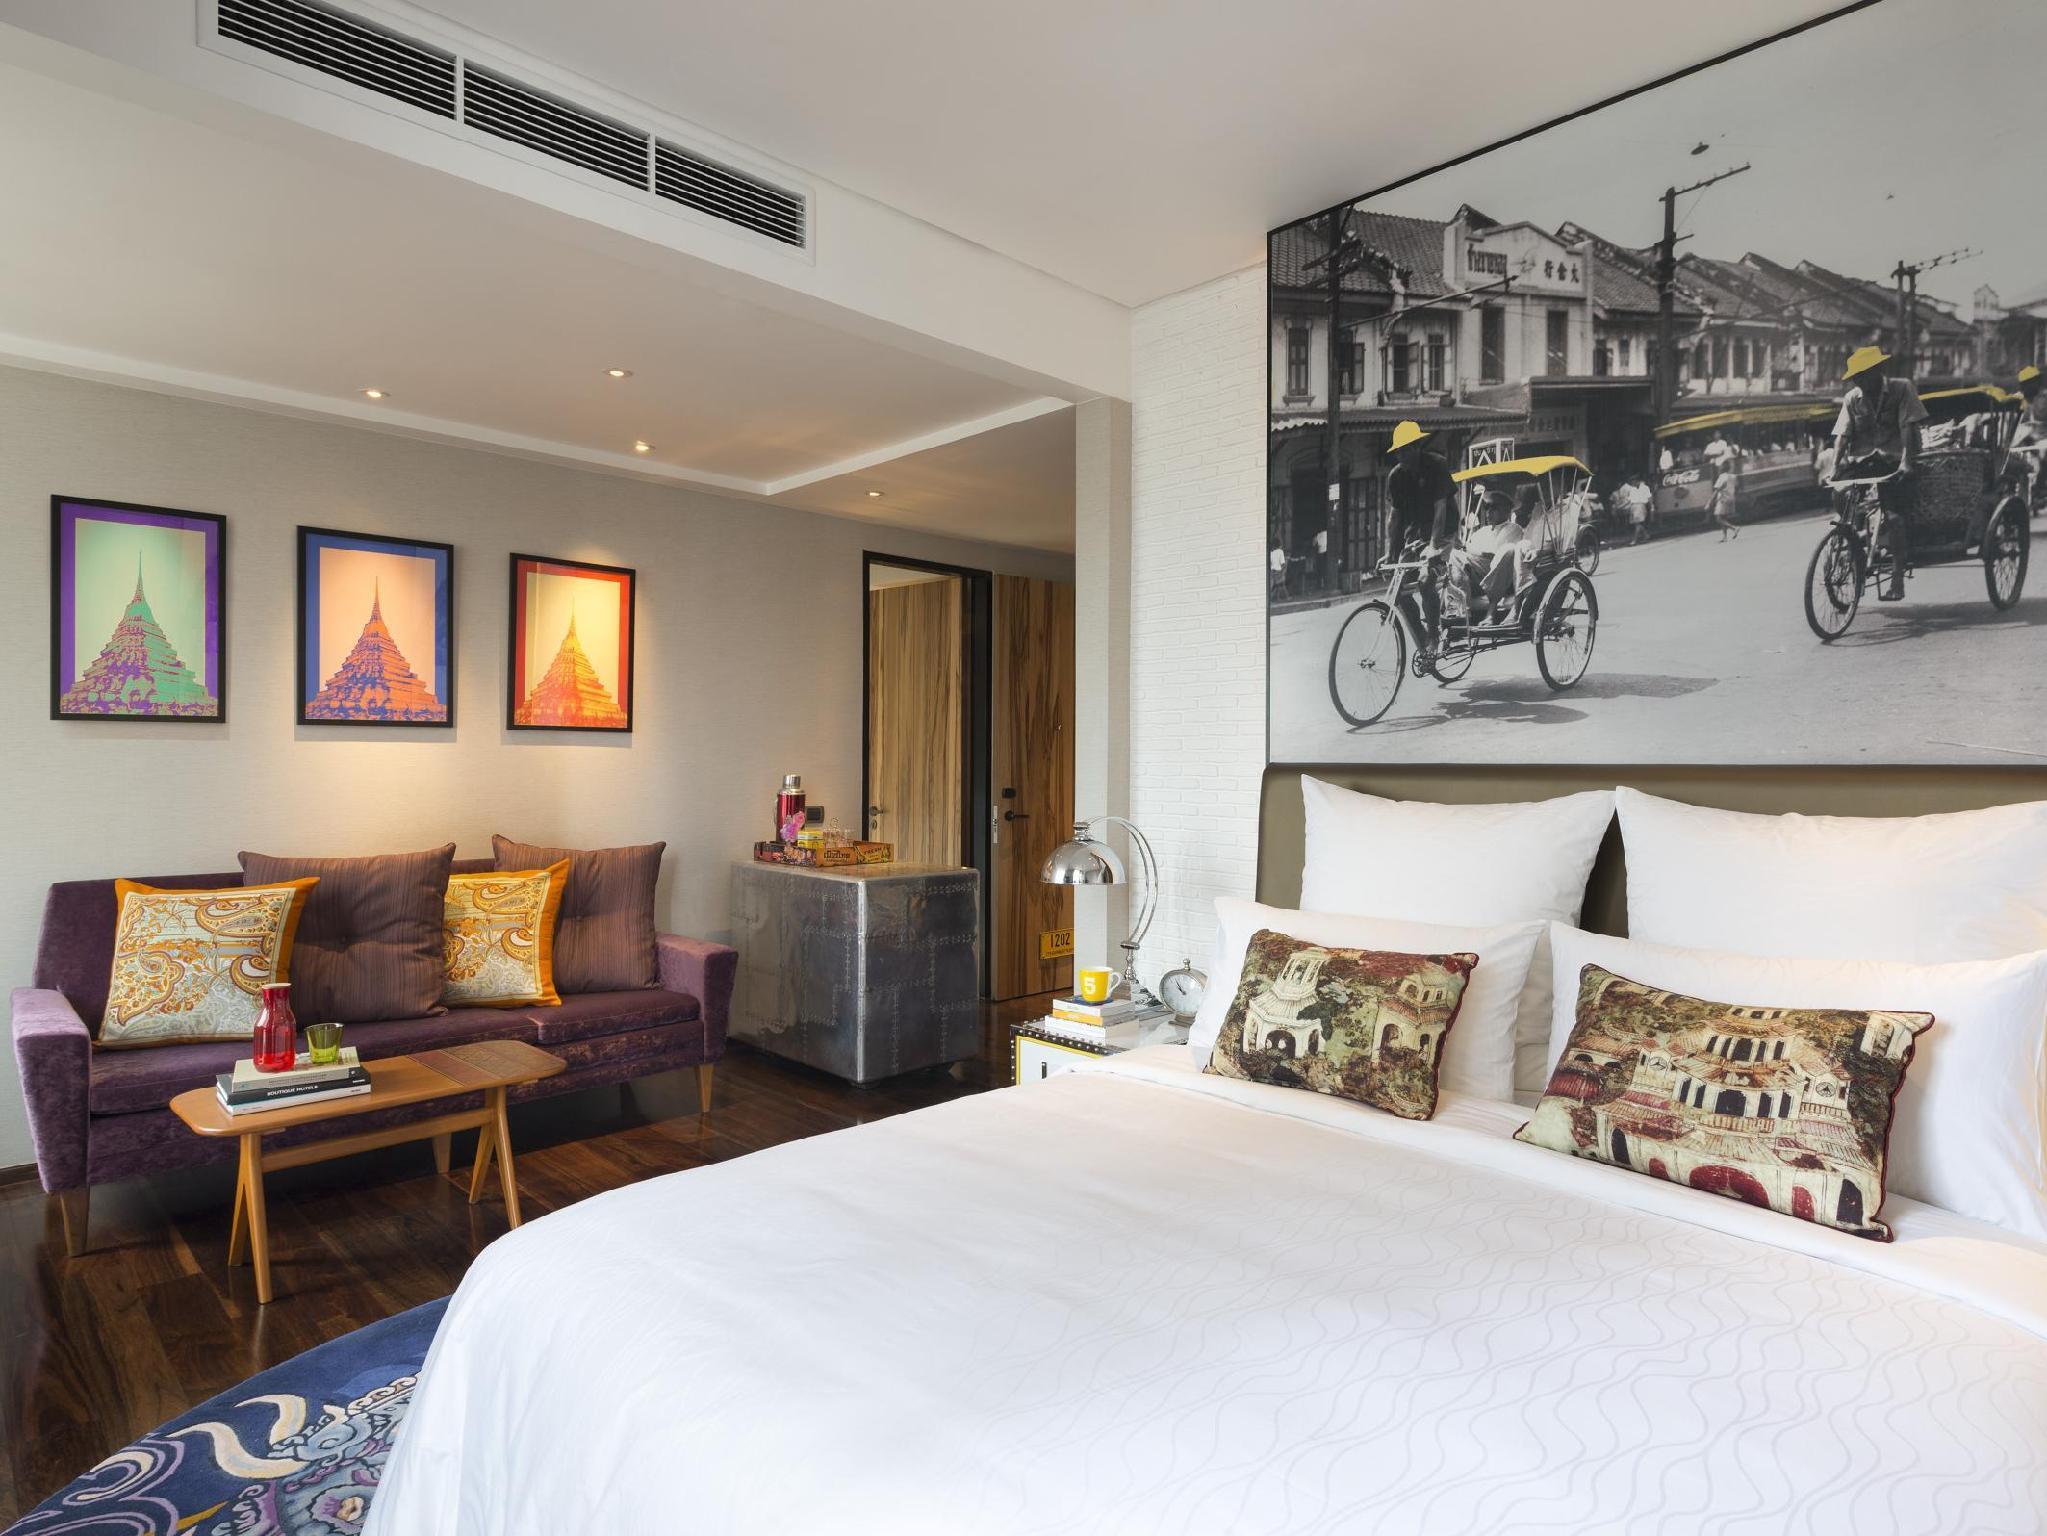 Hotel Indigo Bangkok Wireless Road in Thailand - Room